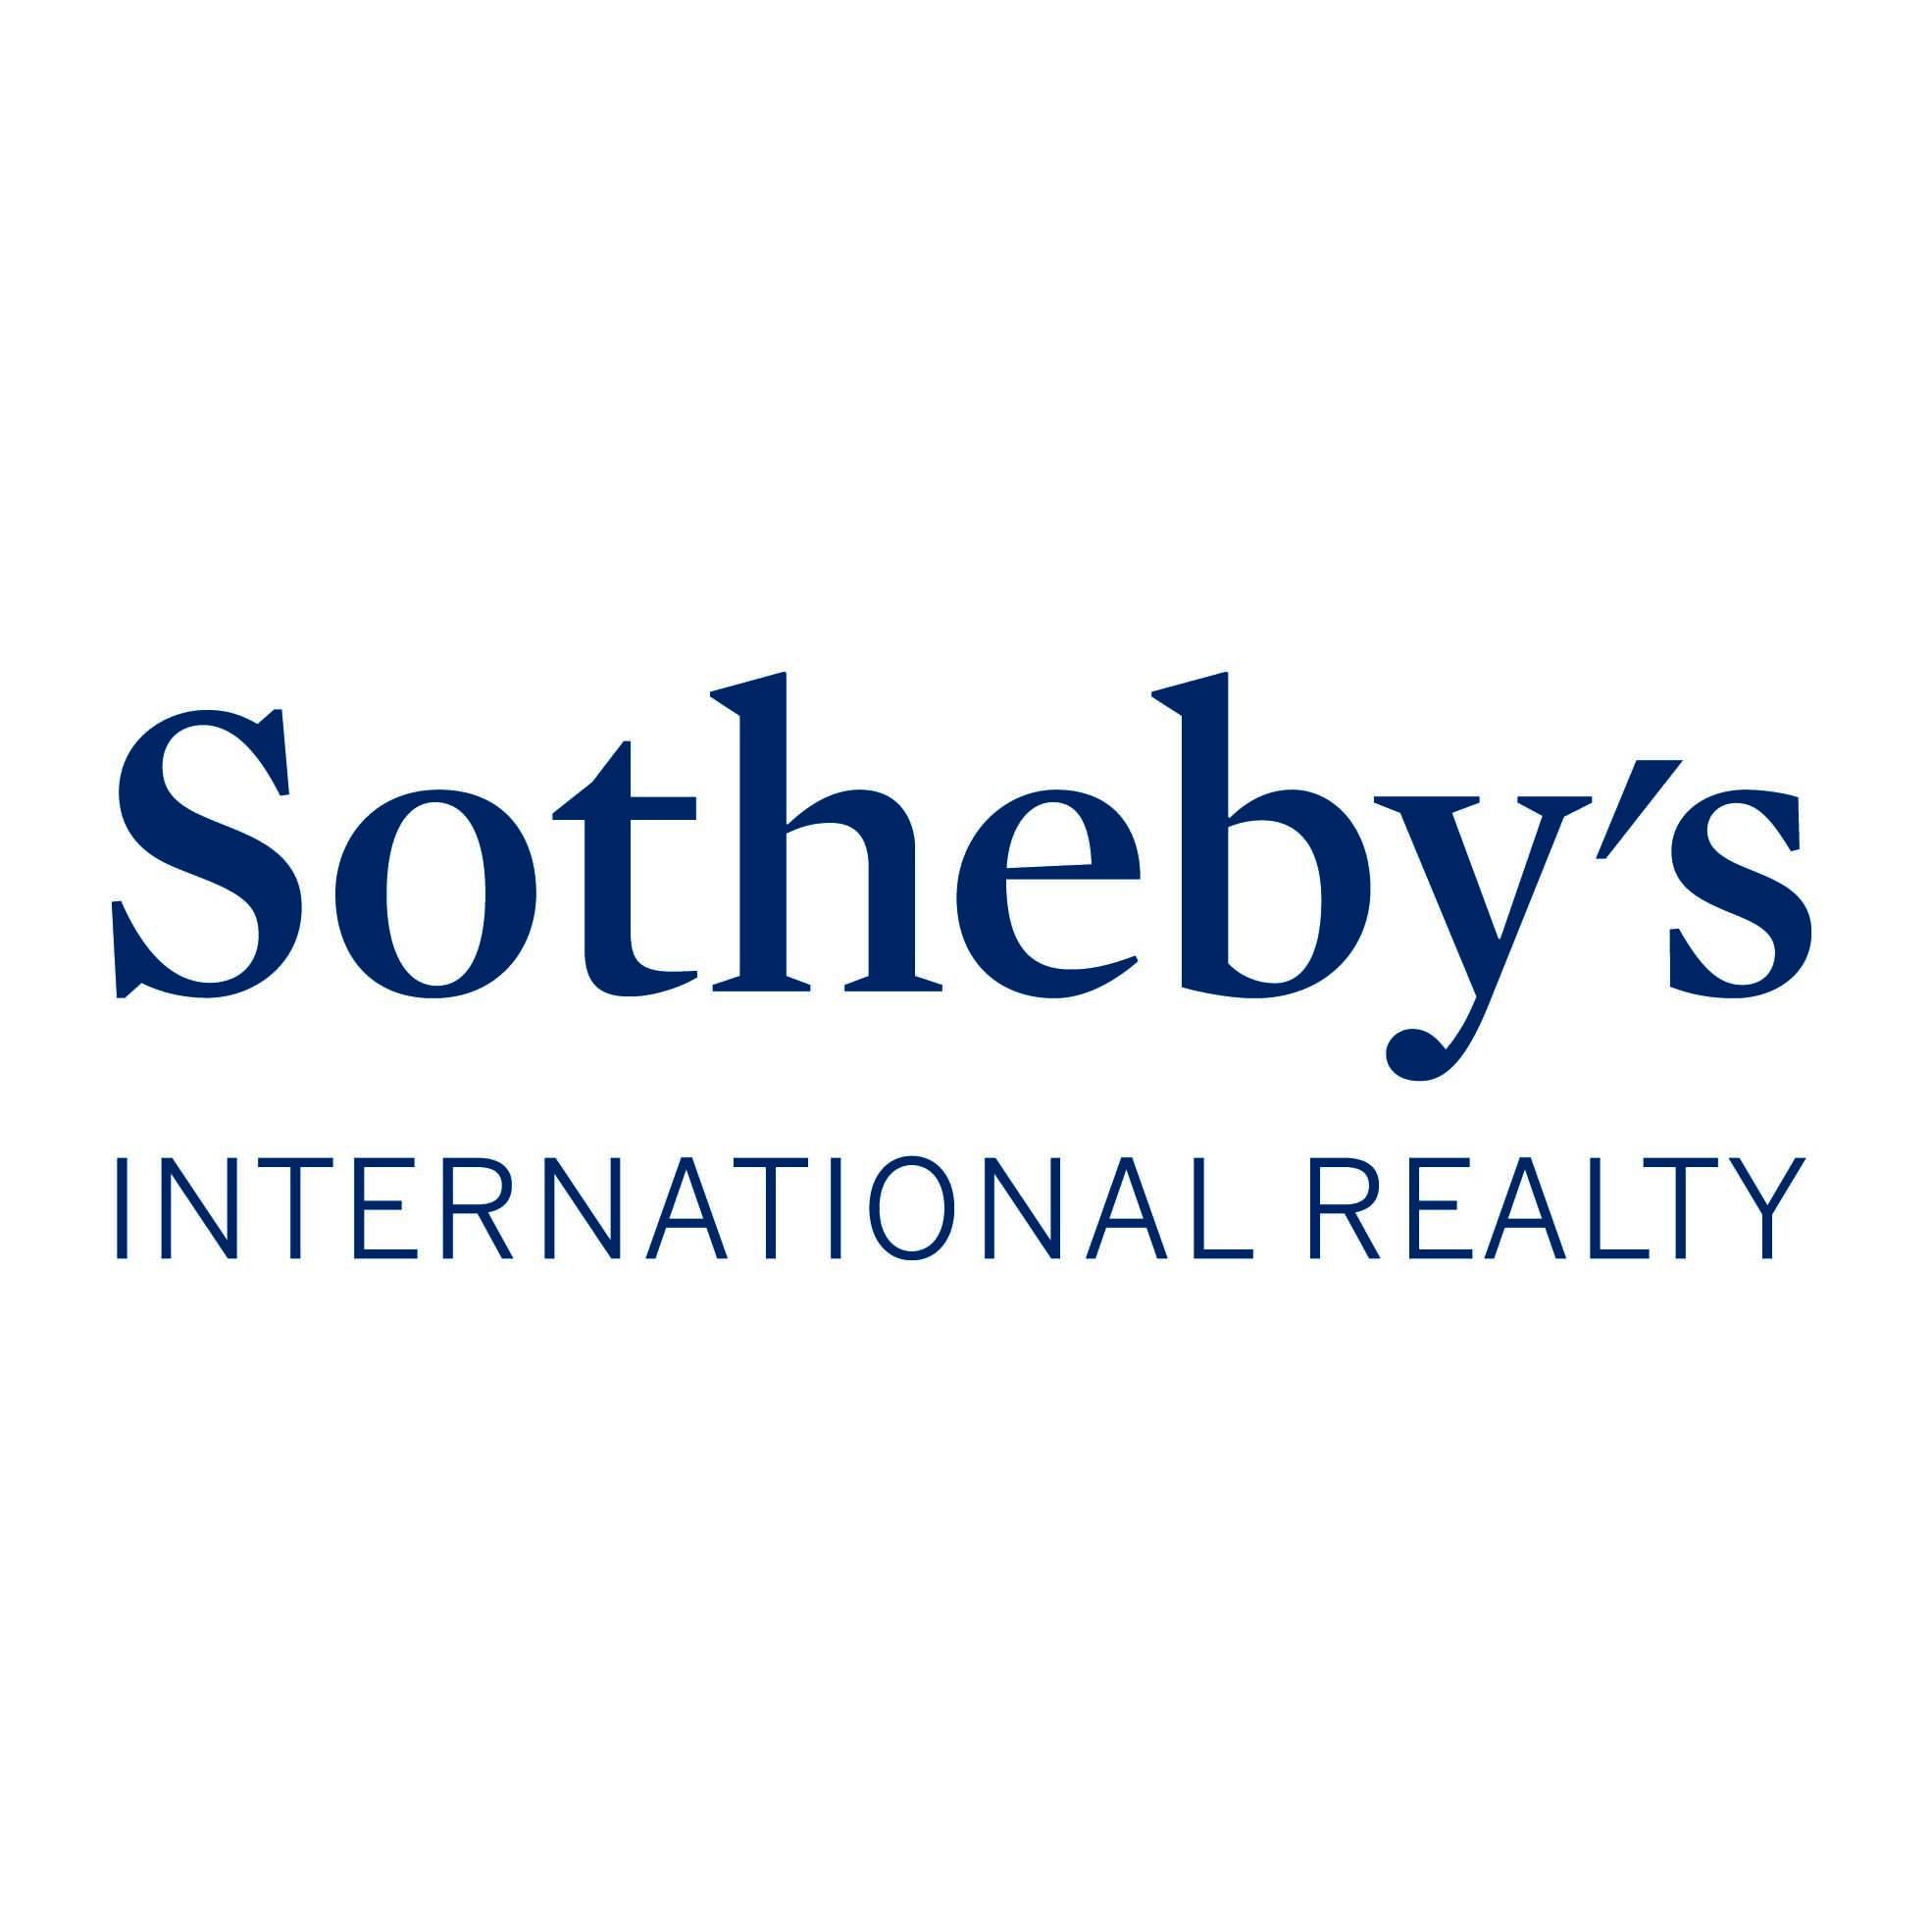 Sotheby's.jpg